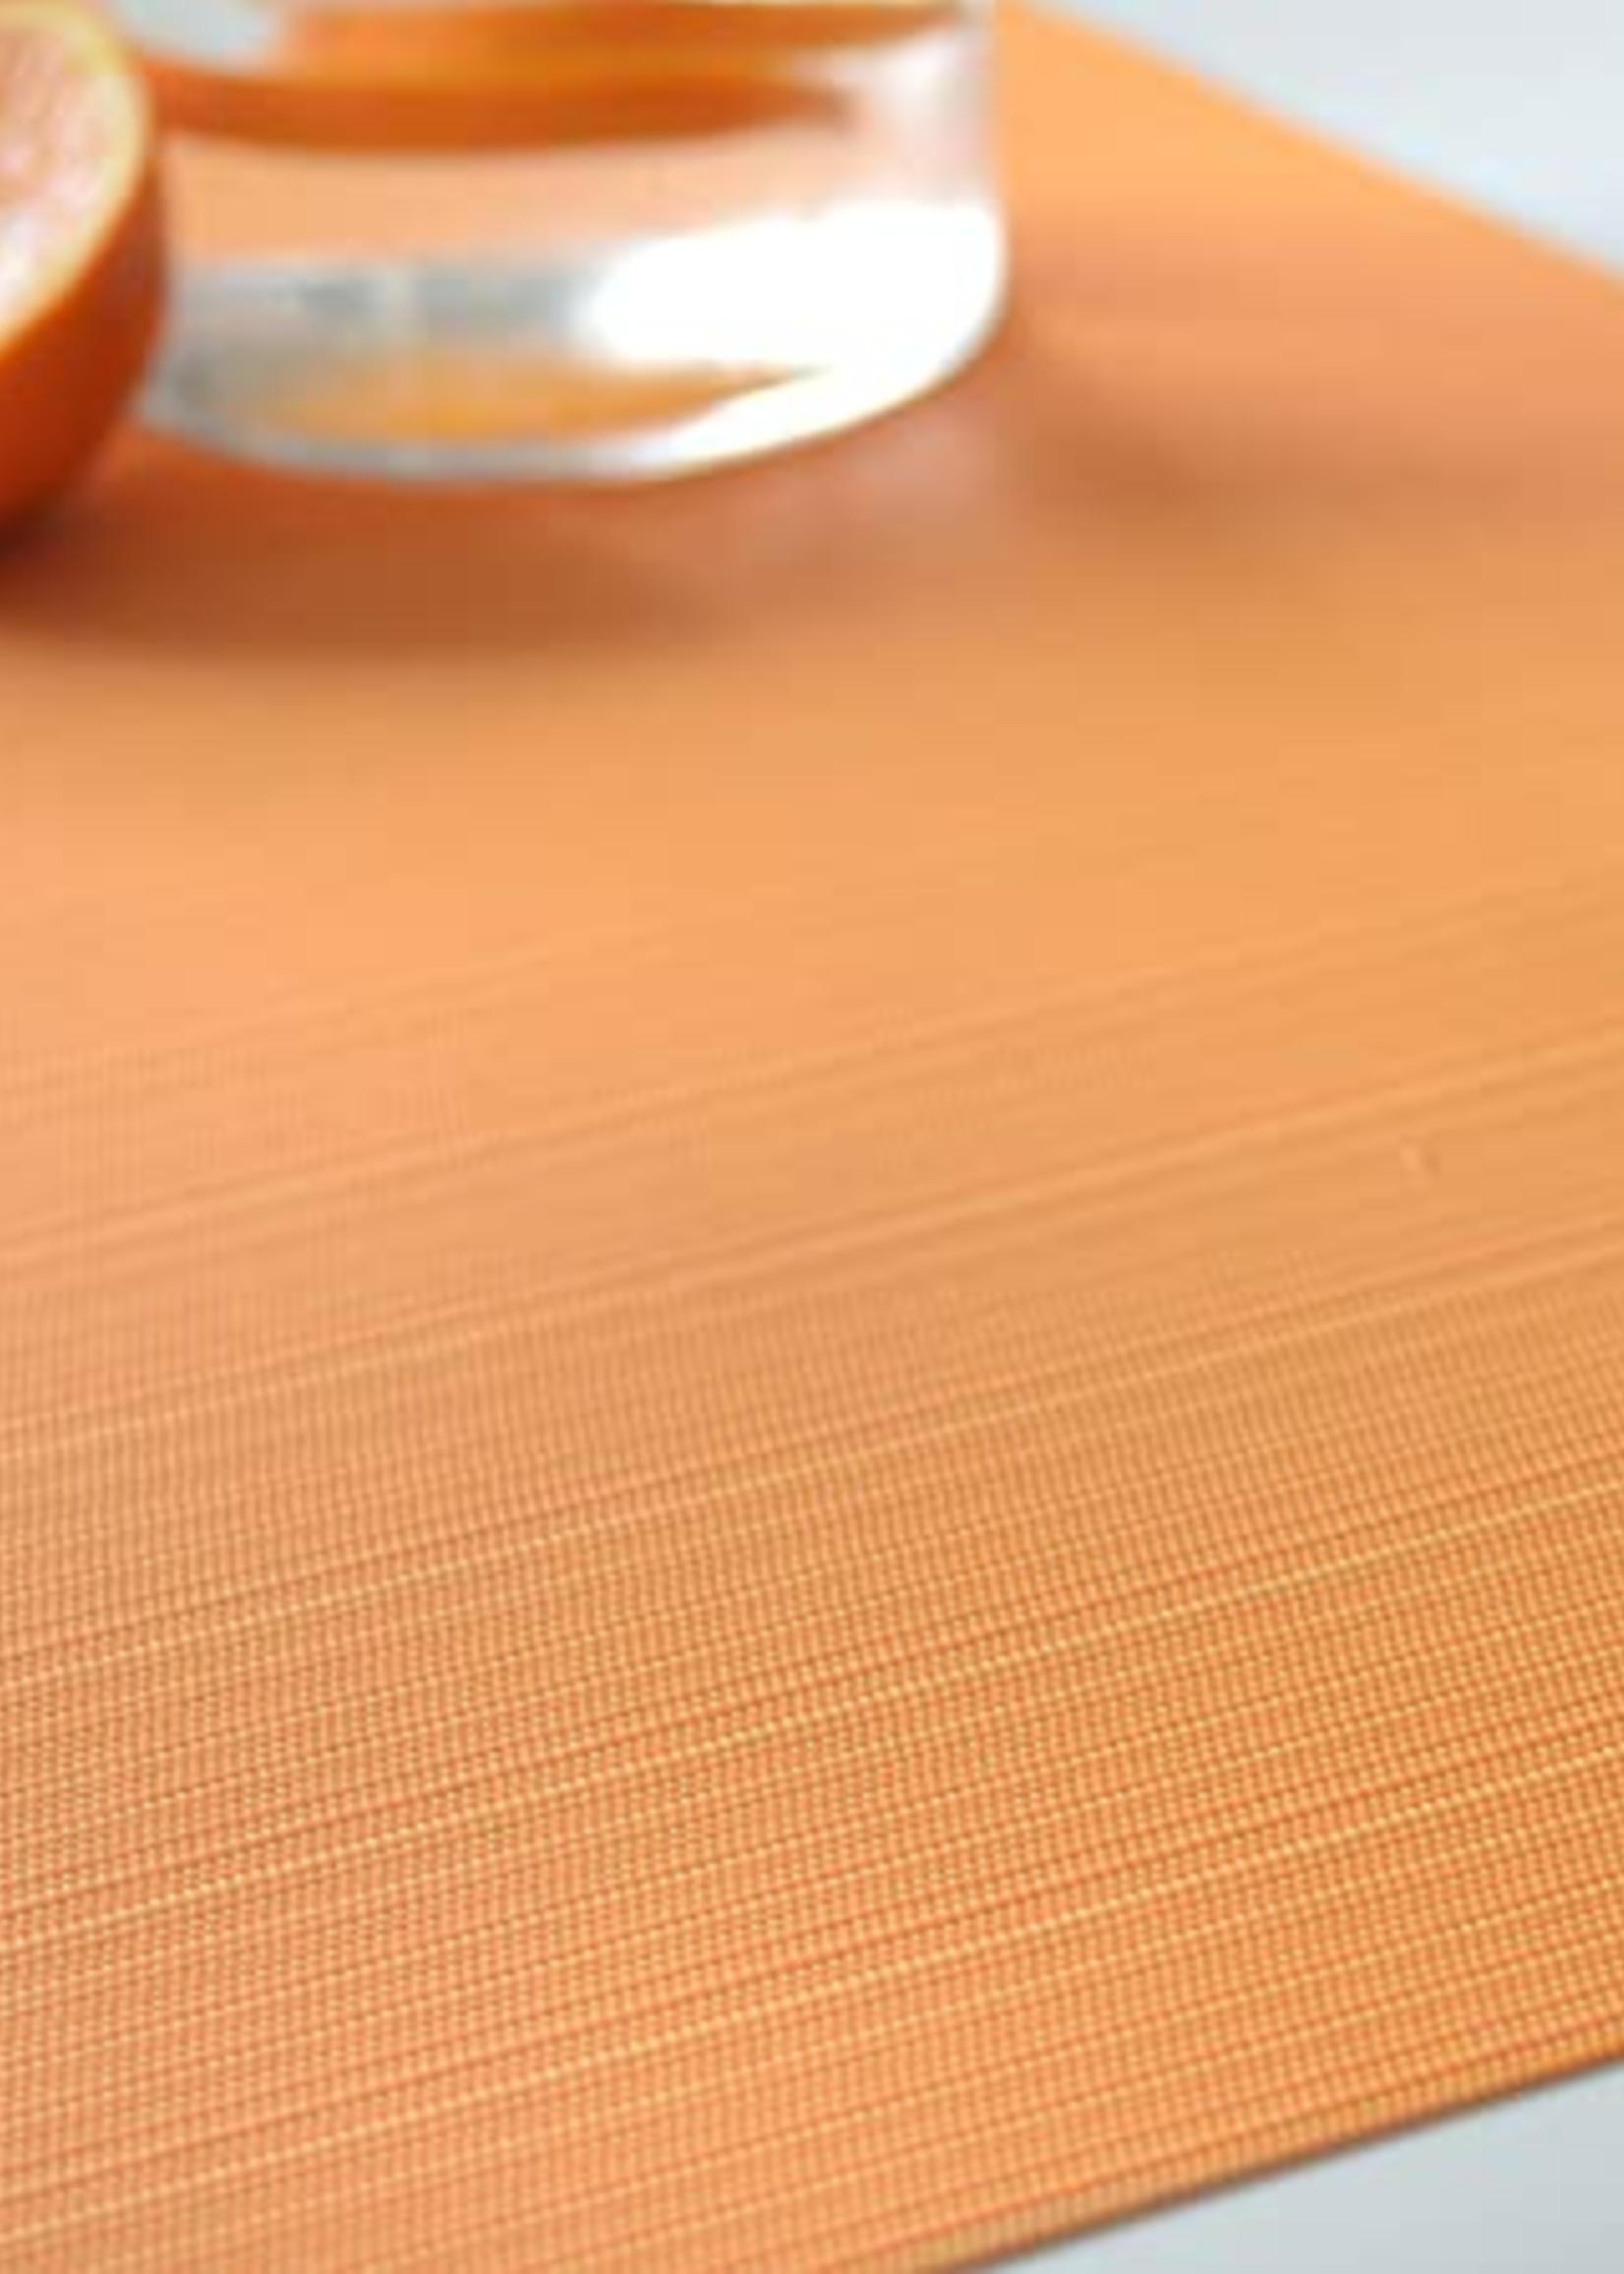 Harman Elite Vinyl Placemat- Orange